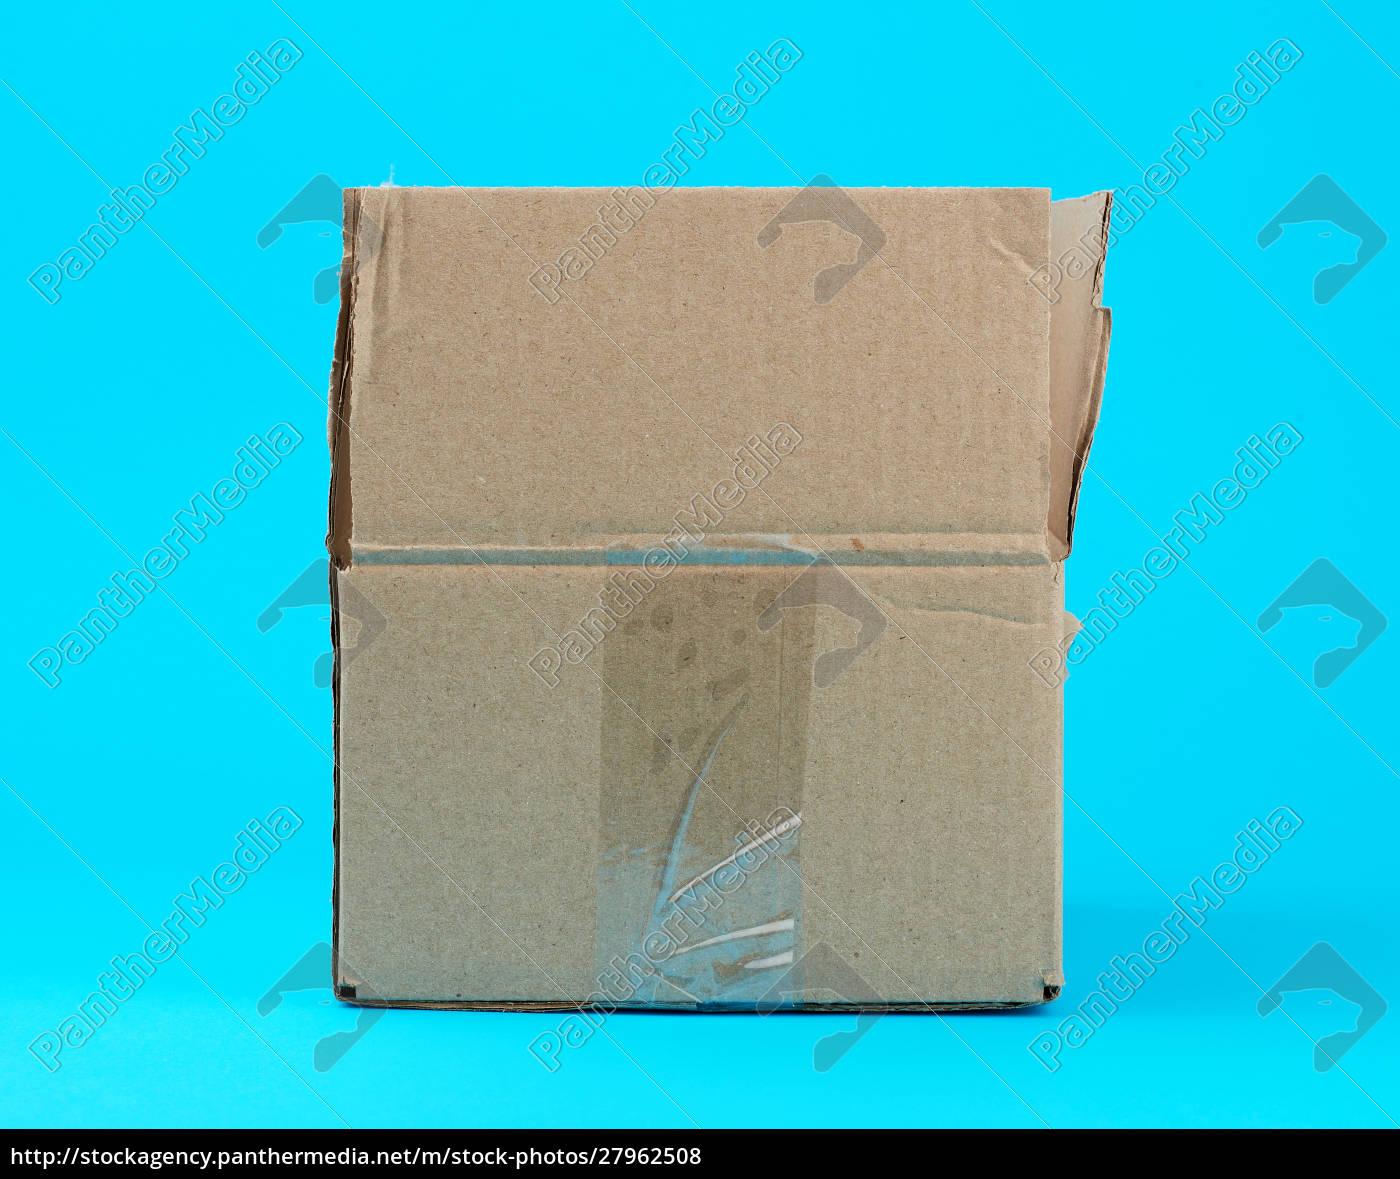 open, brown, cardboard, box, on, a - 27962508